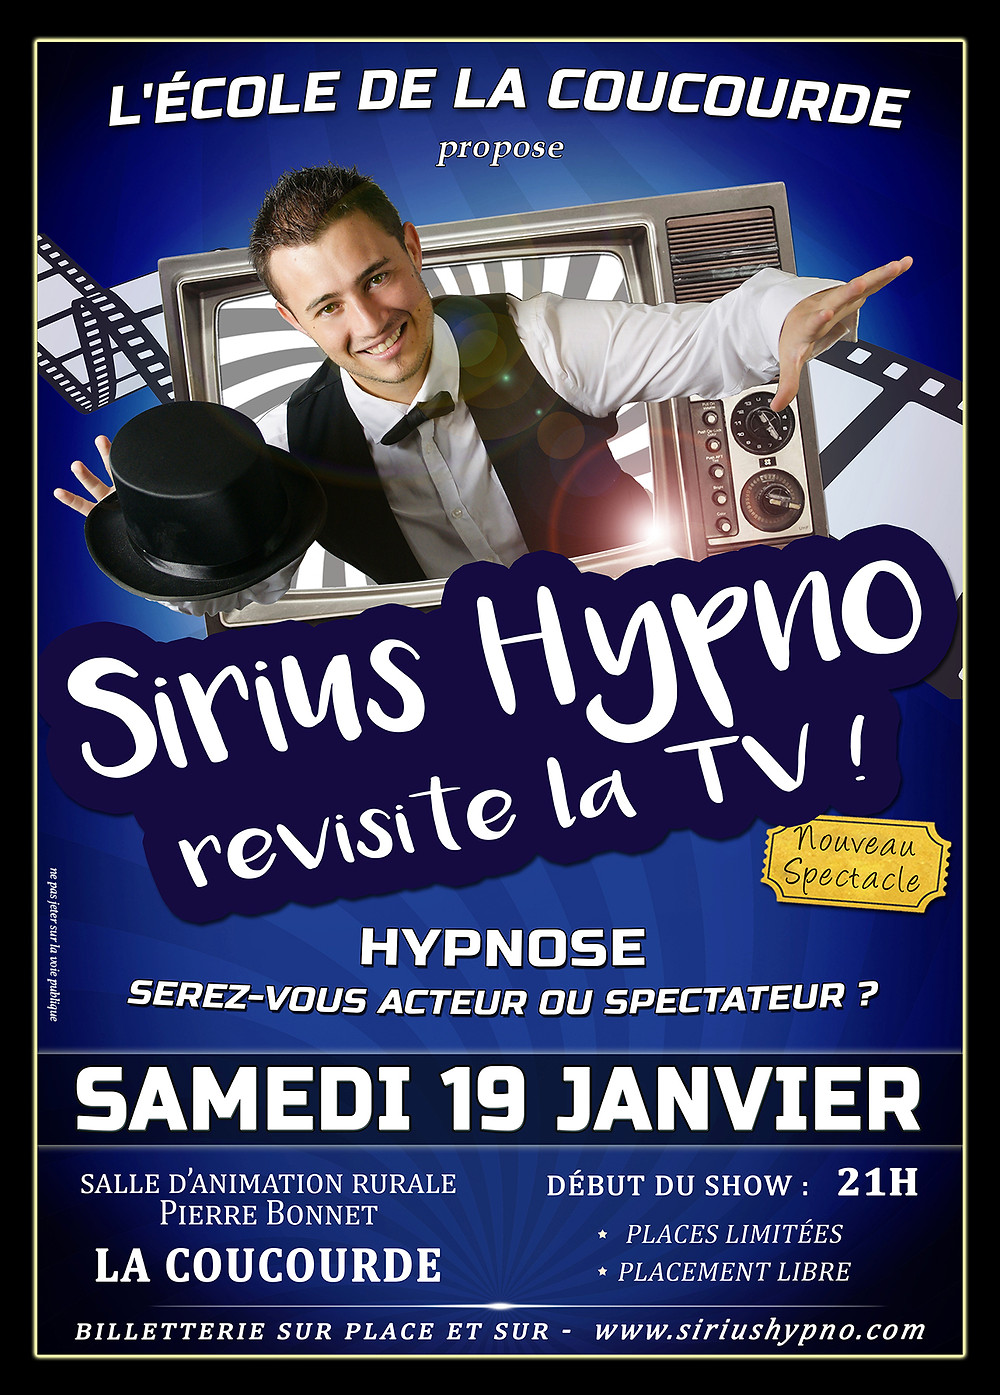 Sirius Hypno revisite la TV - La Coucourde Janvier 2019